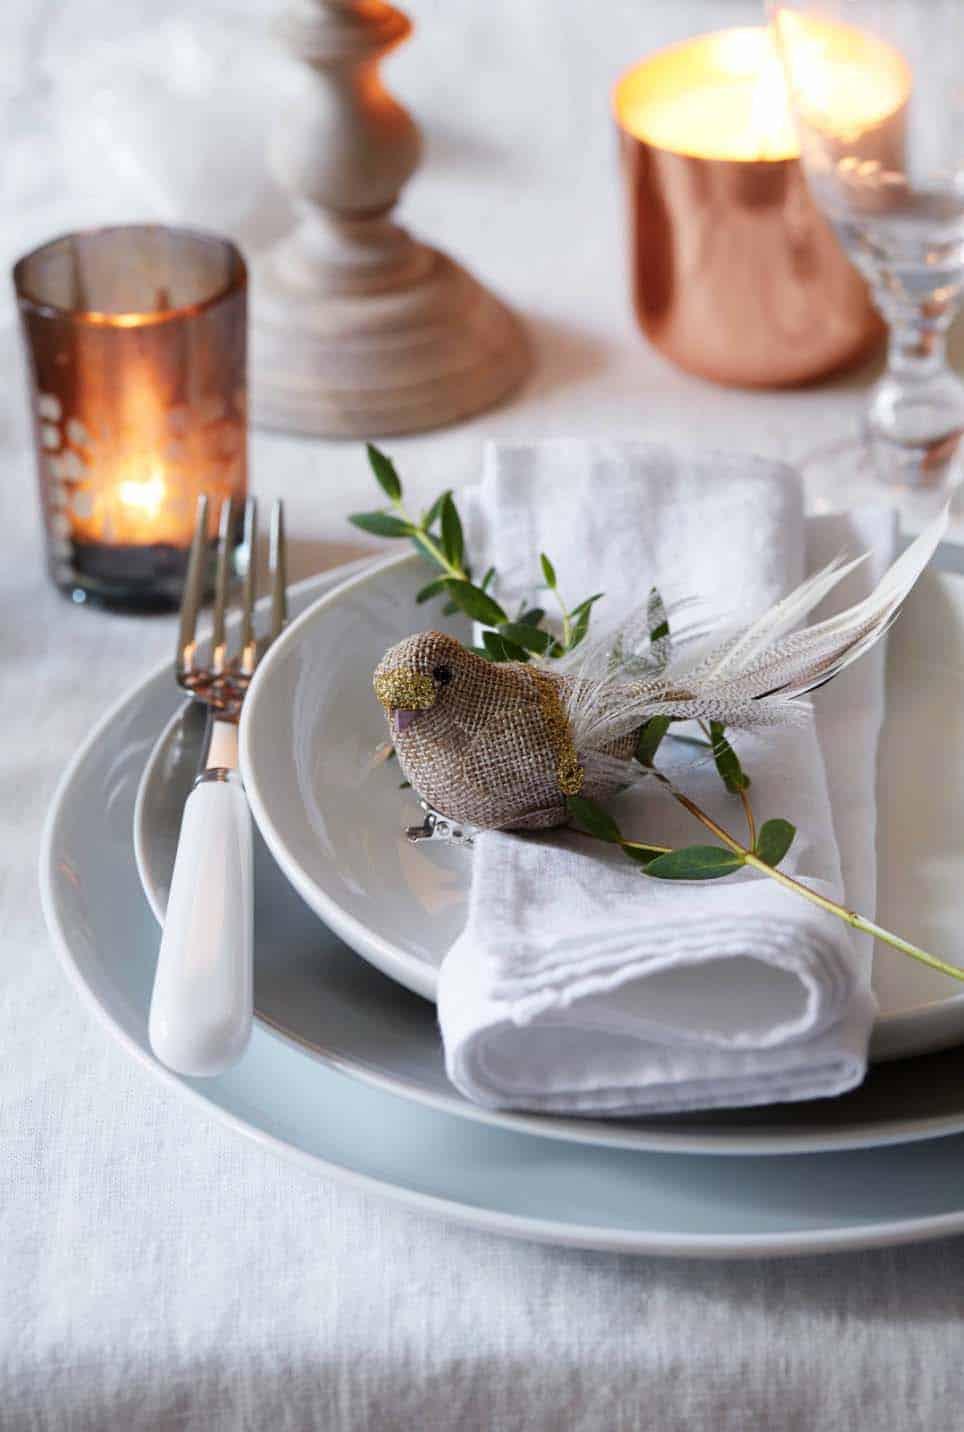 Inspiring Dining Table Christmas Decor Ideas-18-1 Kindesign